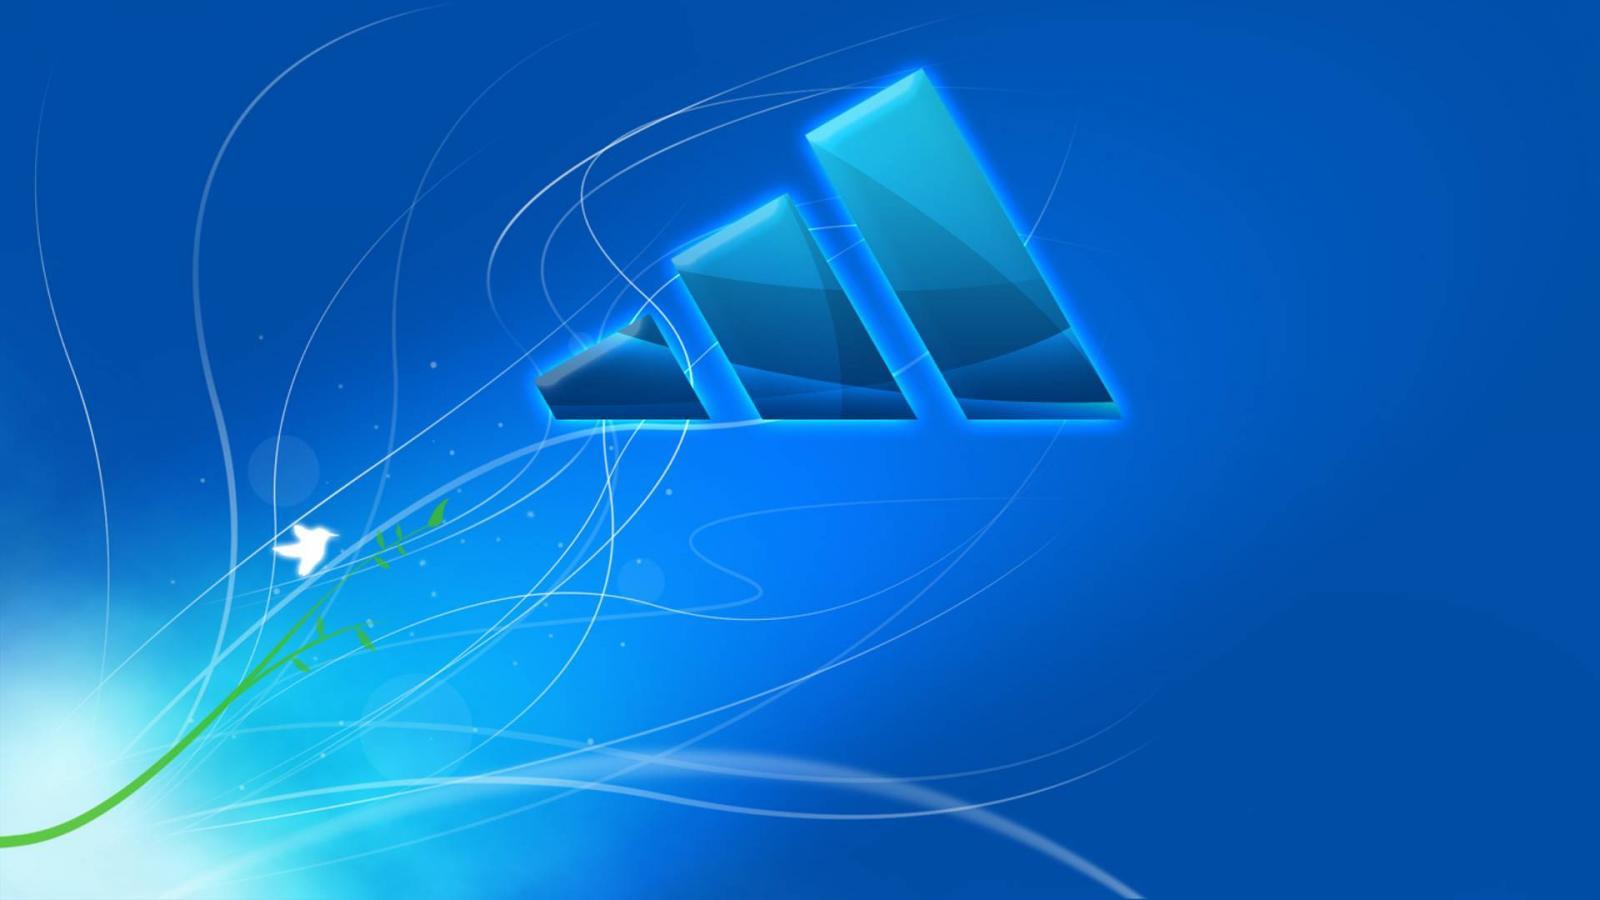 Windows seven wallpaper [10] HQ WALLPAPER   23420 1600x900